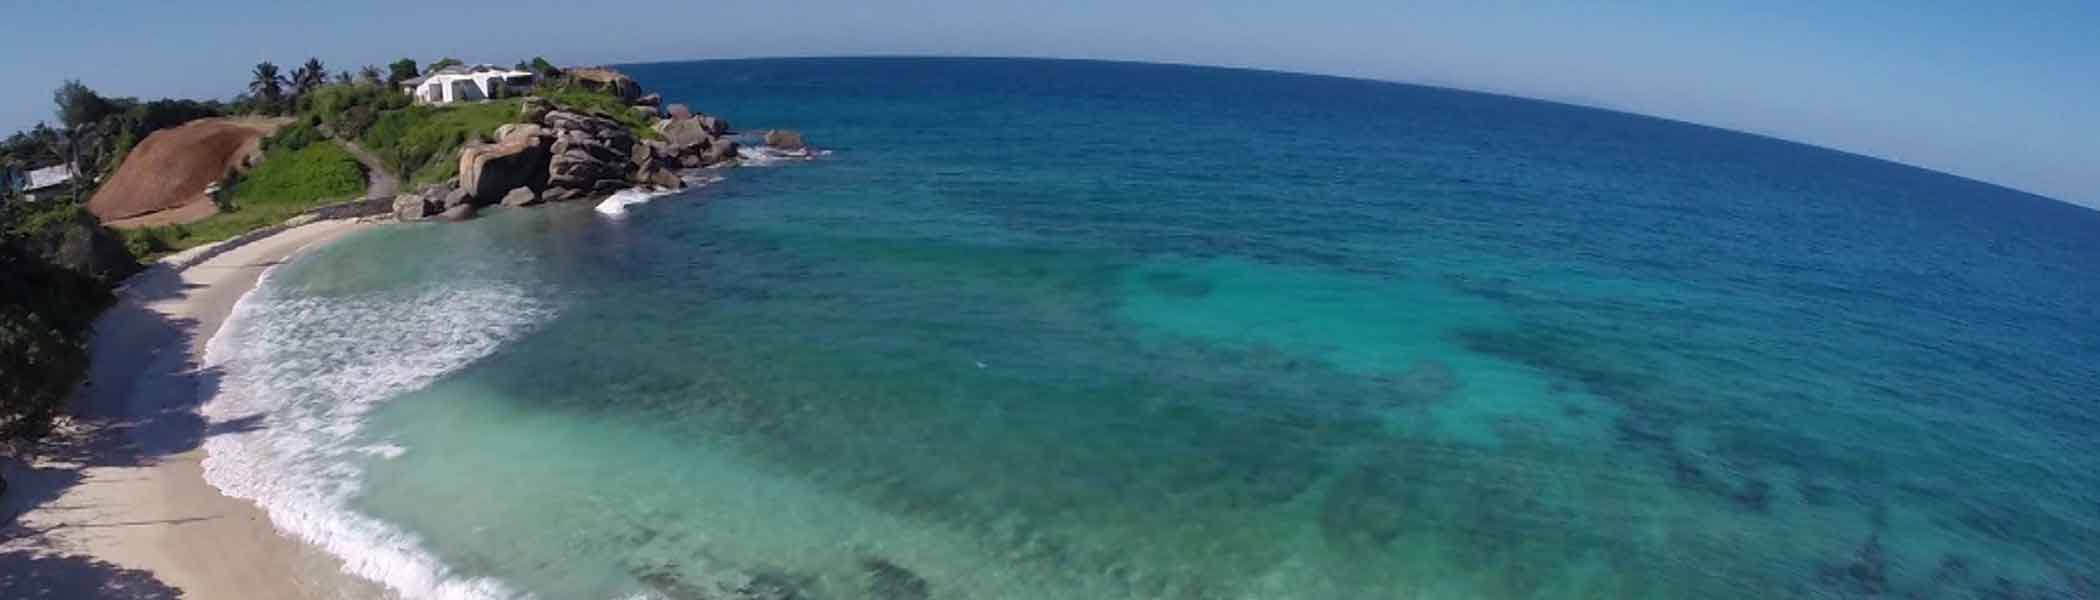 north-east-point-beach, Beaches in Seychelles Islands